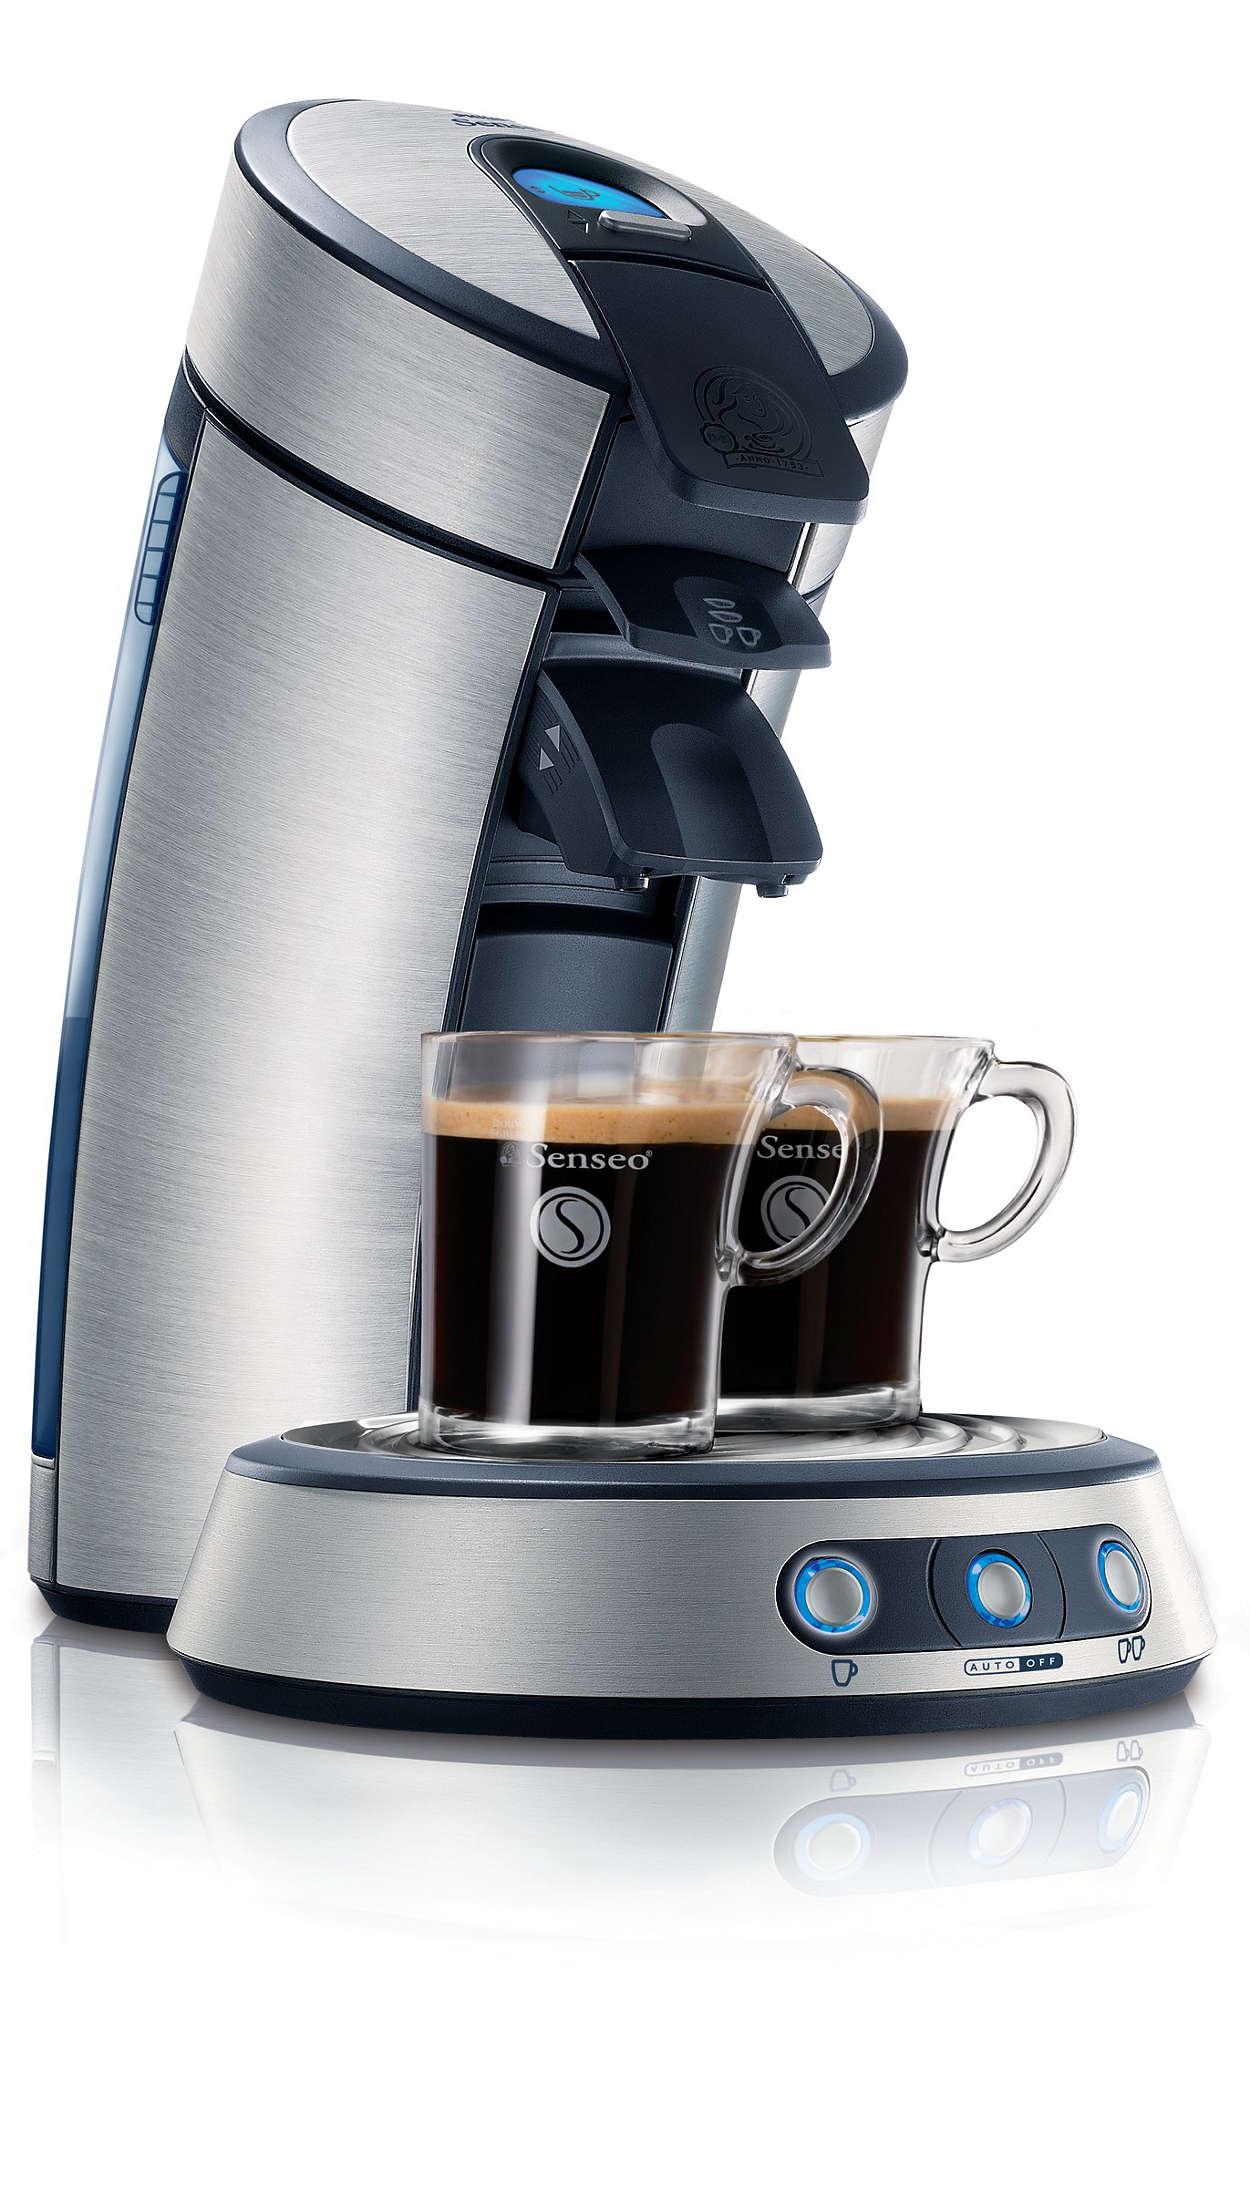 Fantastisk, nybrygget kaffe!